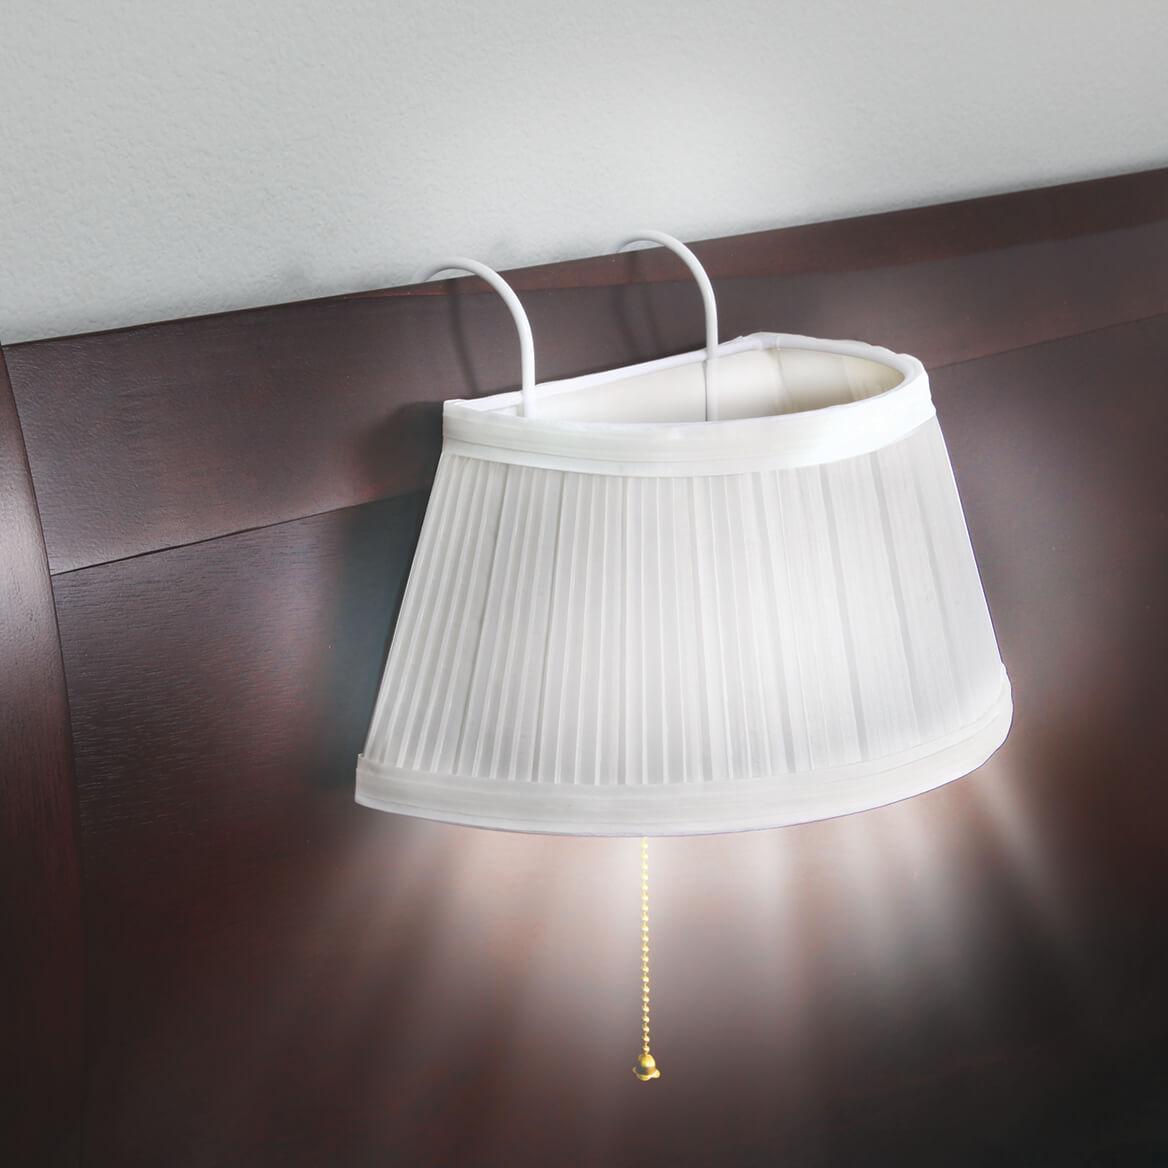 Designer Headboard Lamp-369742